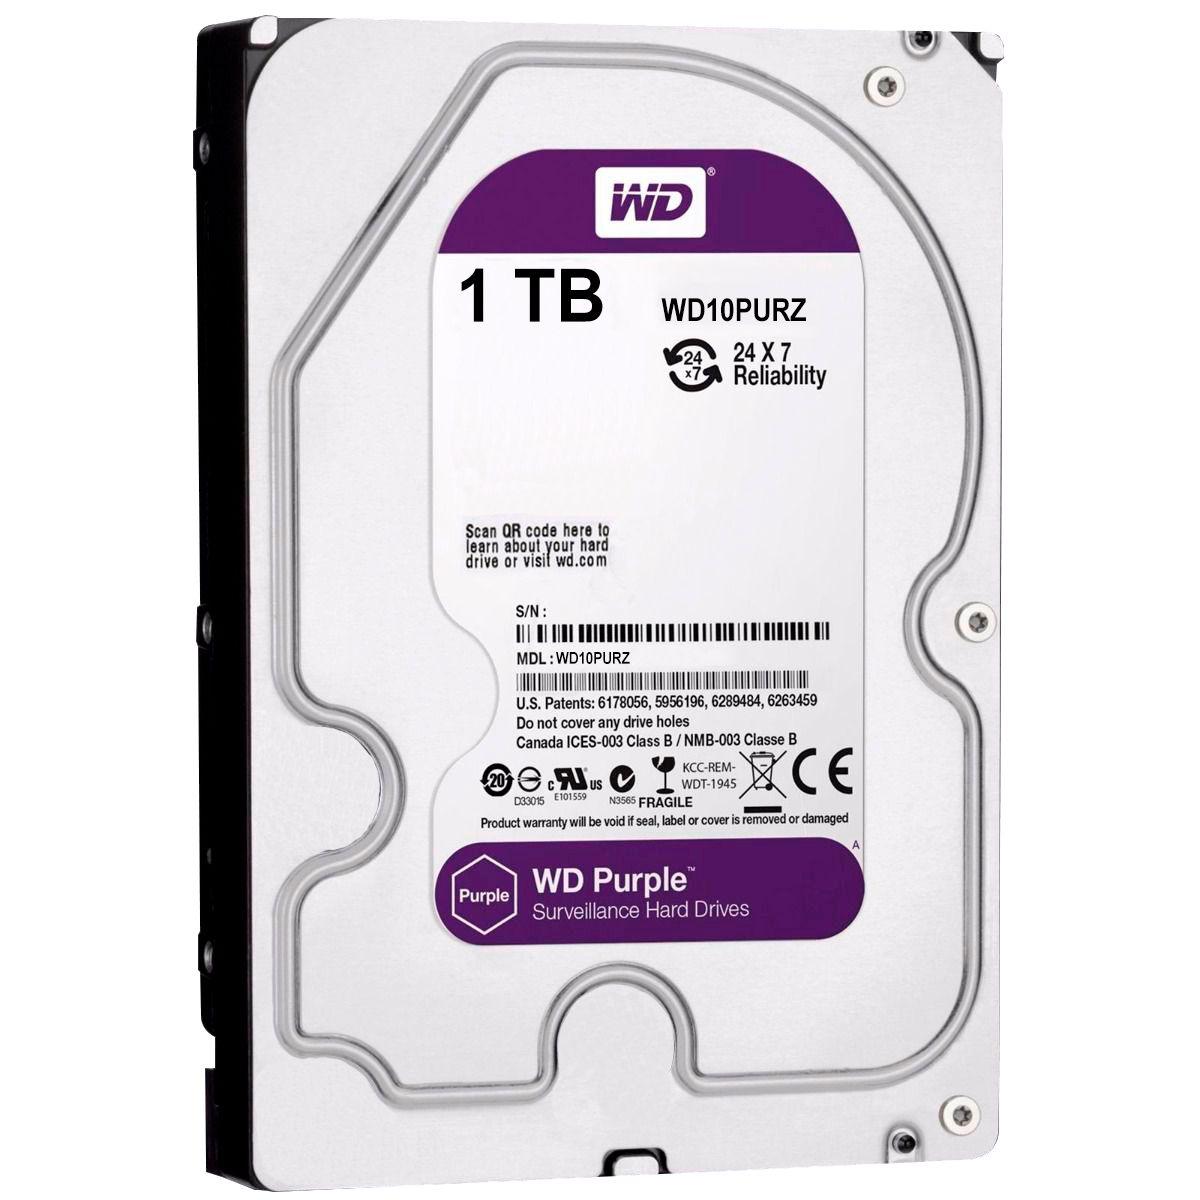 NVR, HVR Stand Alone Intelbras NVD 1208 8 Canais, para Camera IP, OnVif + HD WD Purple 1TB  - Tudo Forte